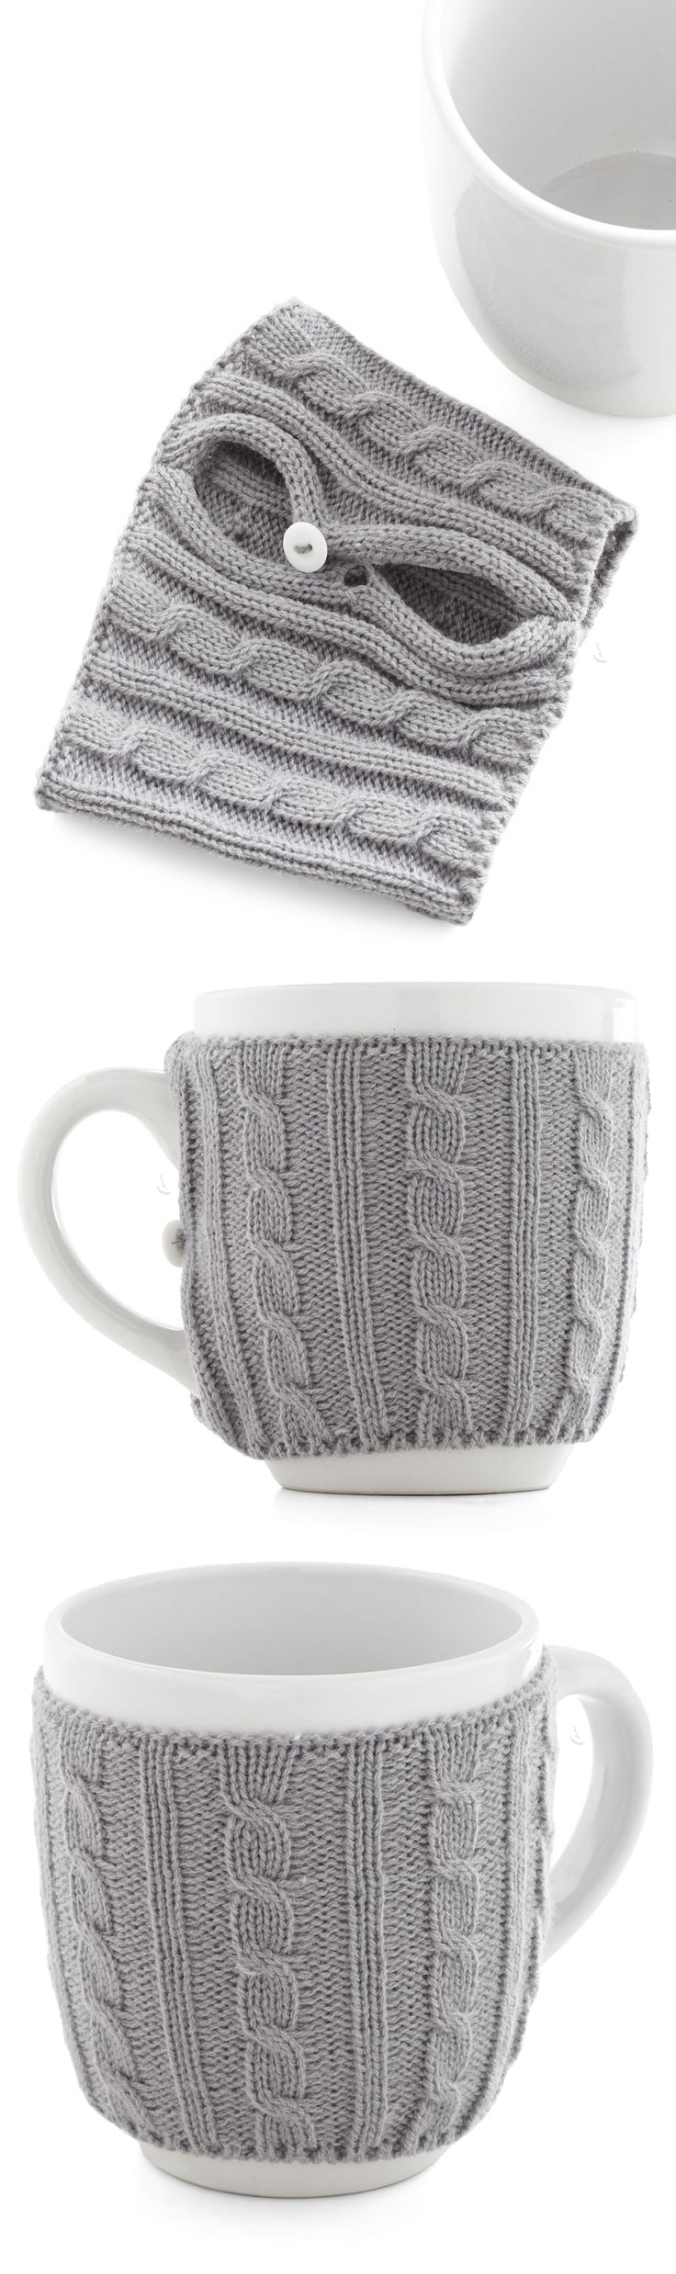 Snug mug - a coffee cup with a sweater! Keeps your tea warm #product_design